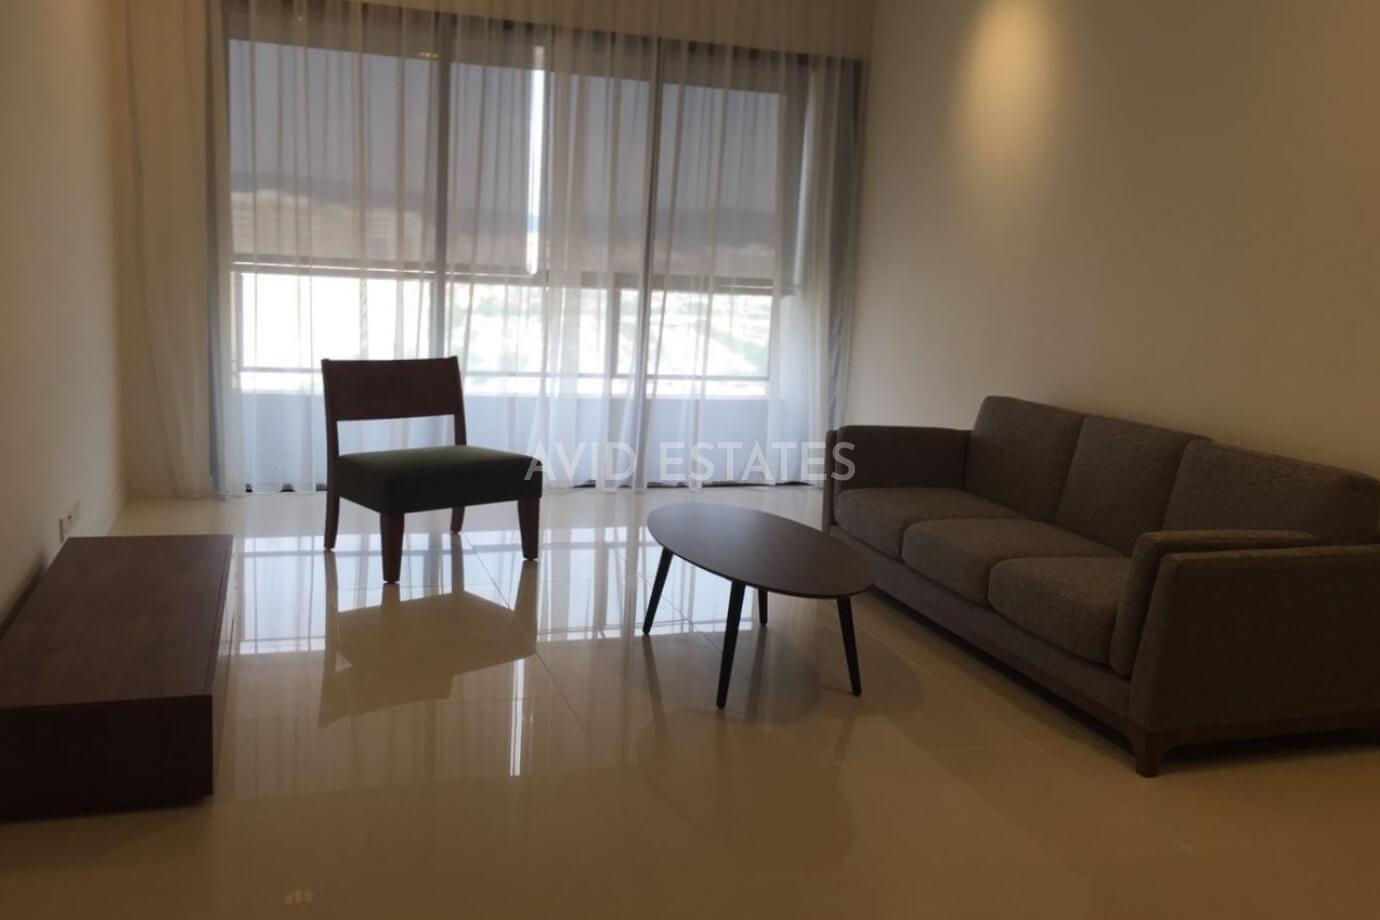 G Residence, Kuala Lumpur,Kuala Lumpur, 2 Bedrooms Bedrooms, ,2 BathroomsBathrooms,Condominium / Serviced Residence,To Let,G Residence,1327